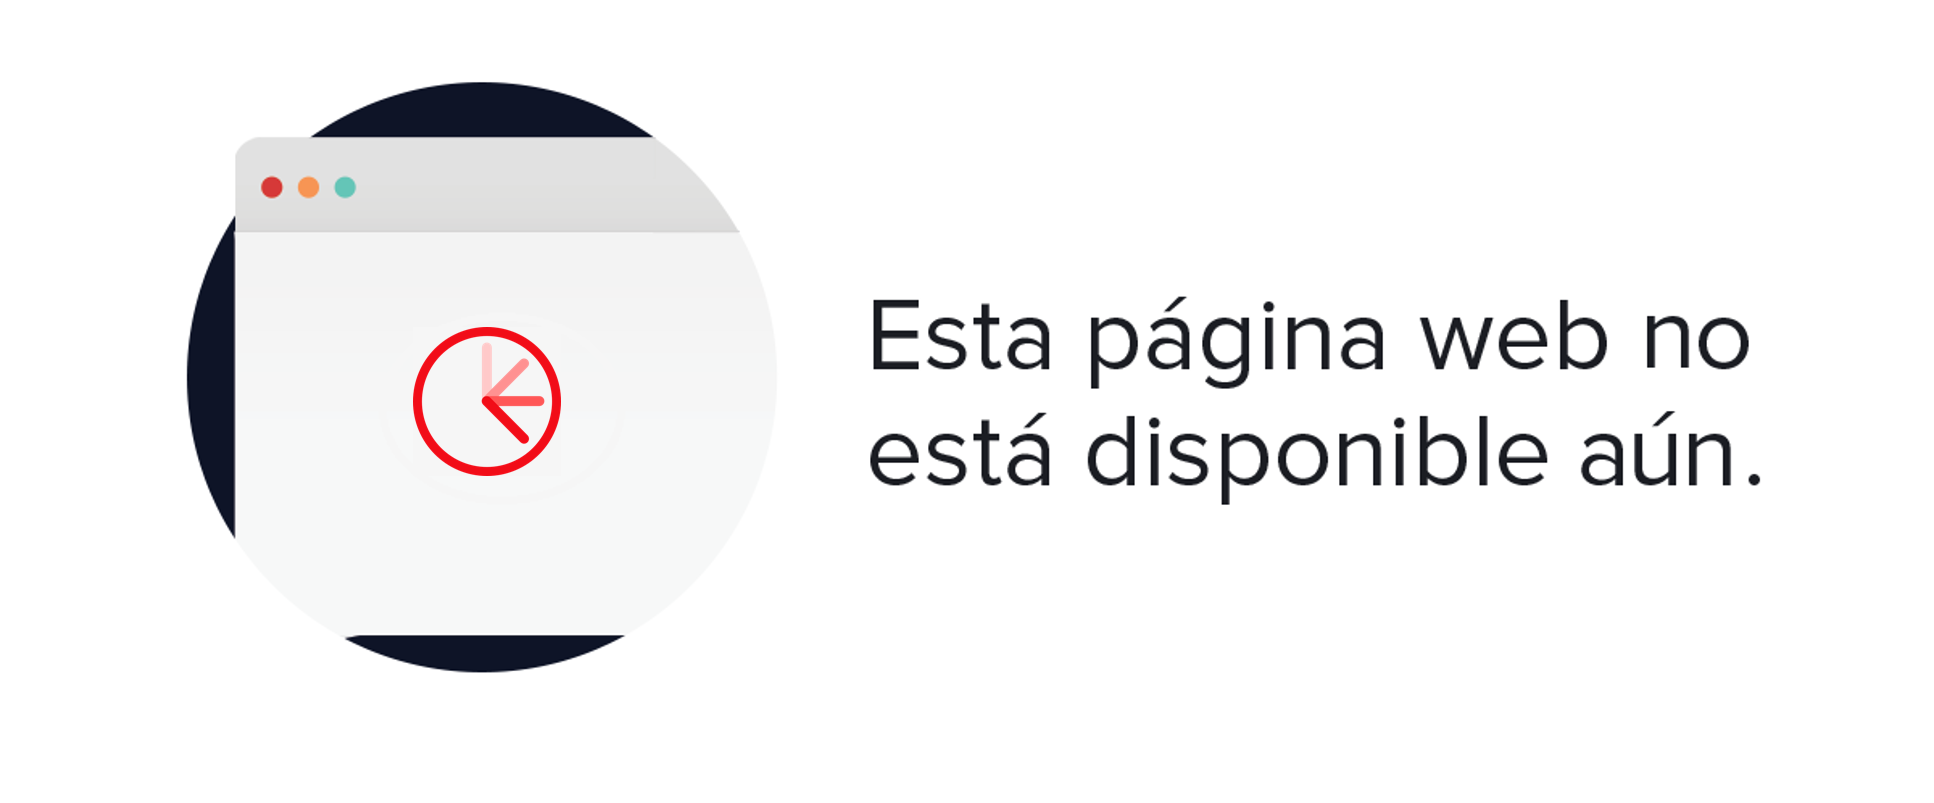 Elogy - Chaqueta tweed de mujer Elogy con dos bolsillos Rojo 001084922400324003 - ABKCOQW